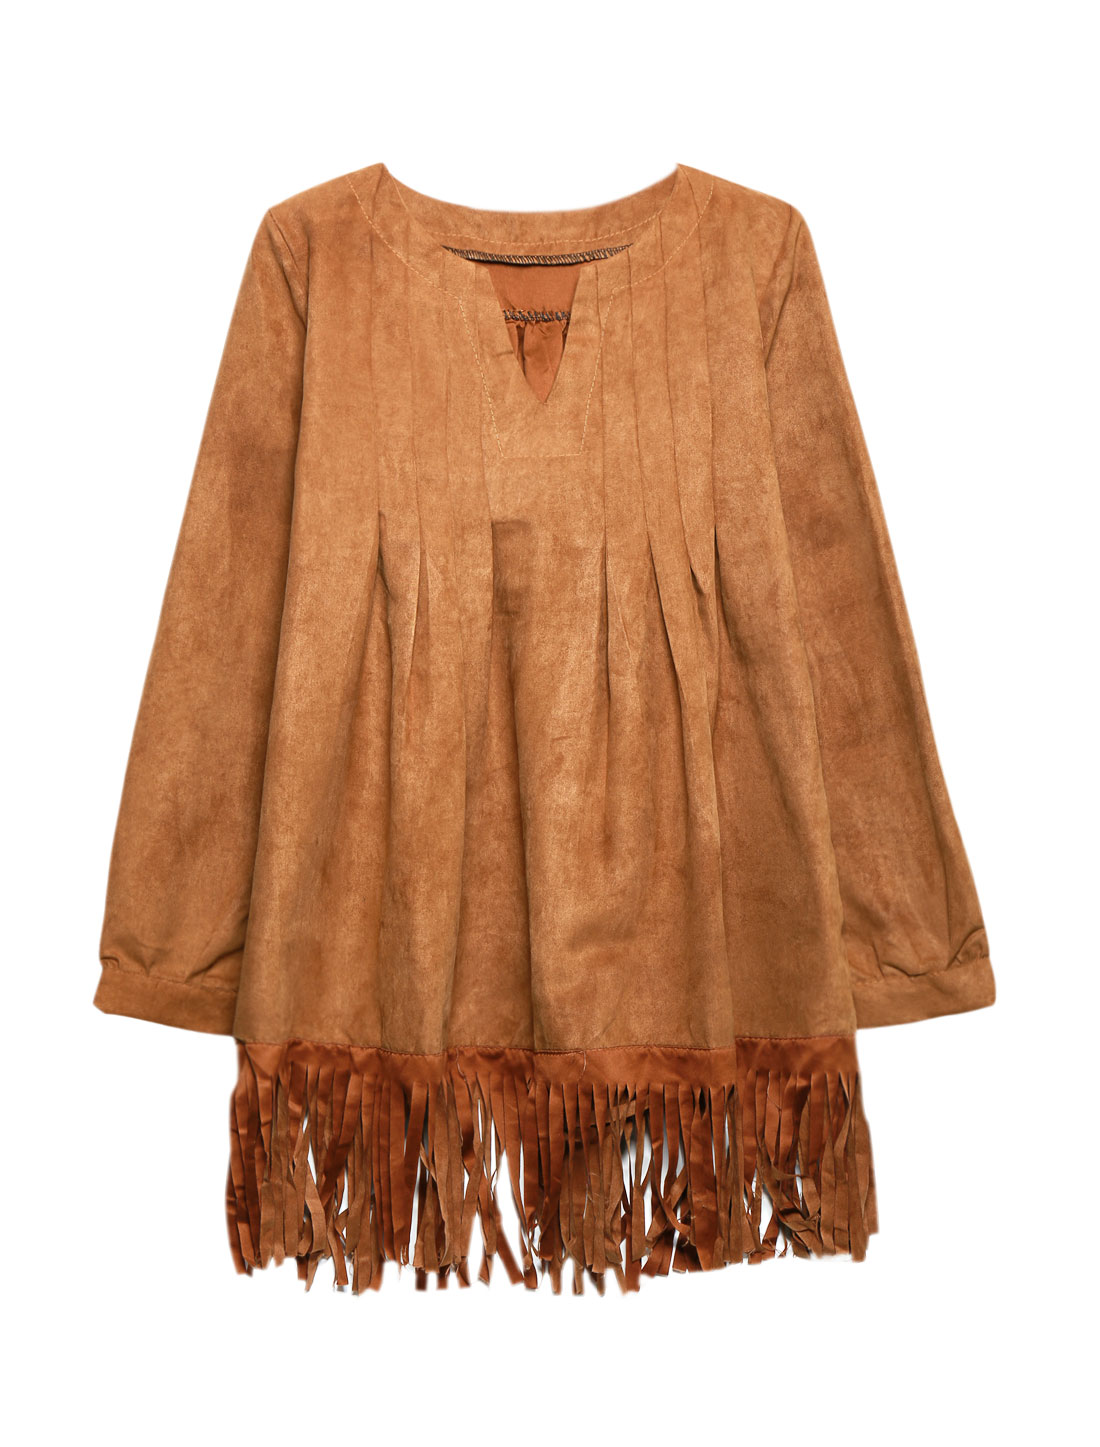 Women Split Neck Long Sleeves Pleated Tassels Loose Tunic Top Brown S